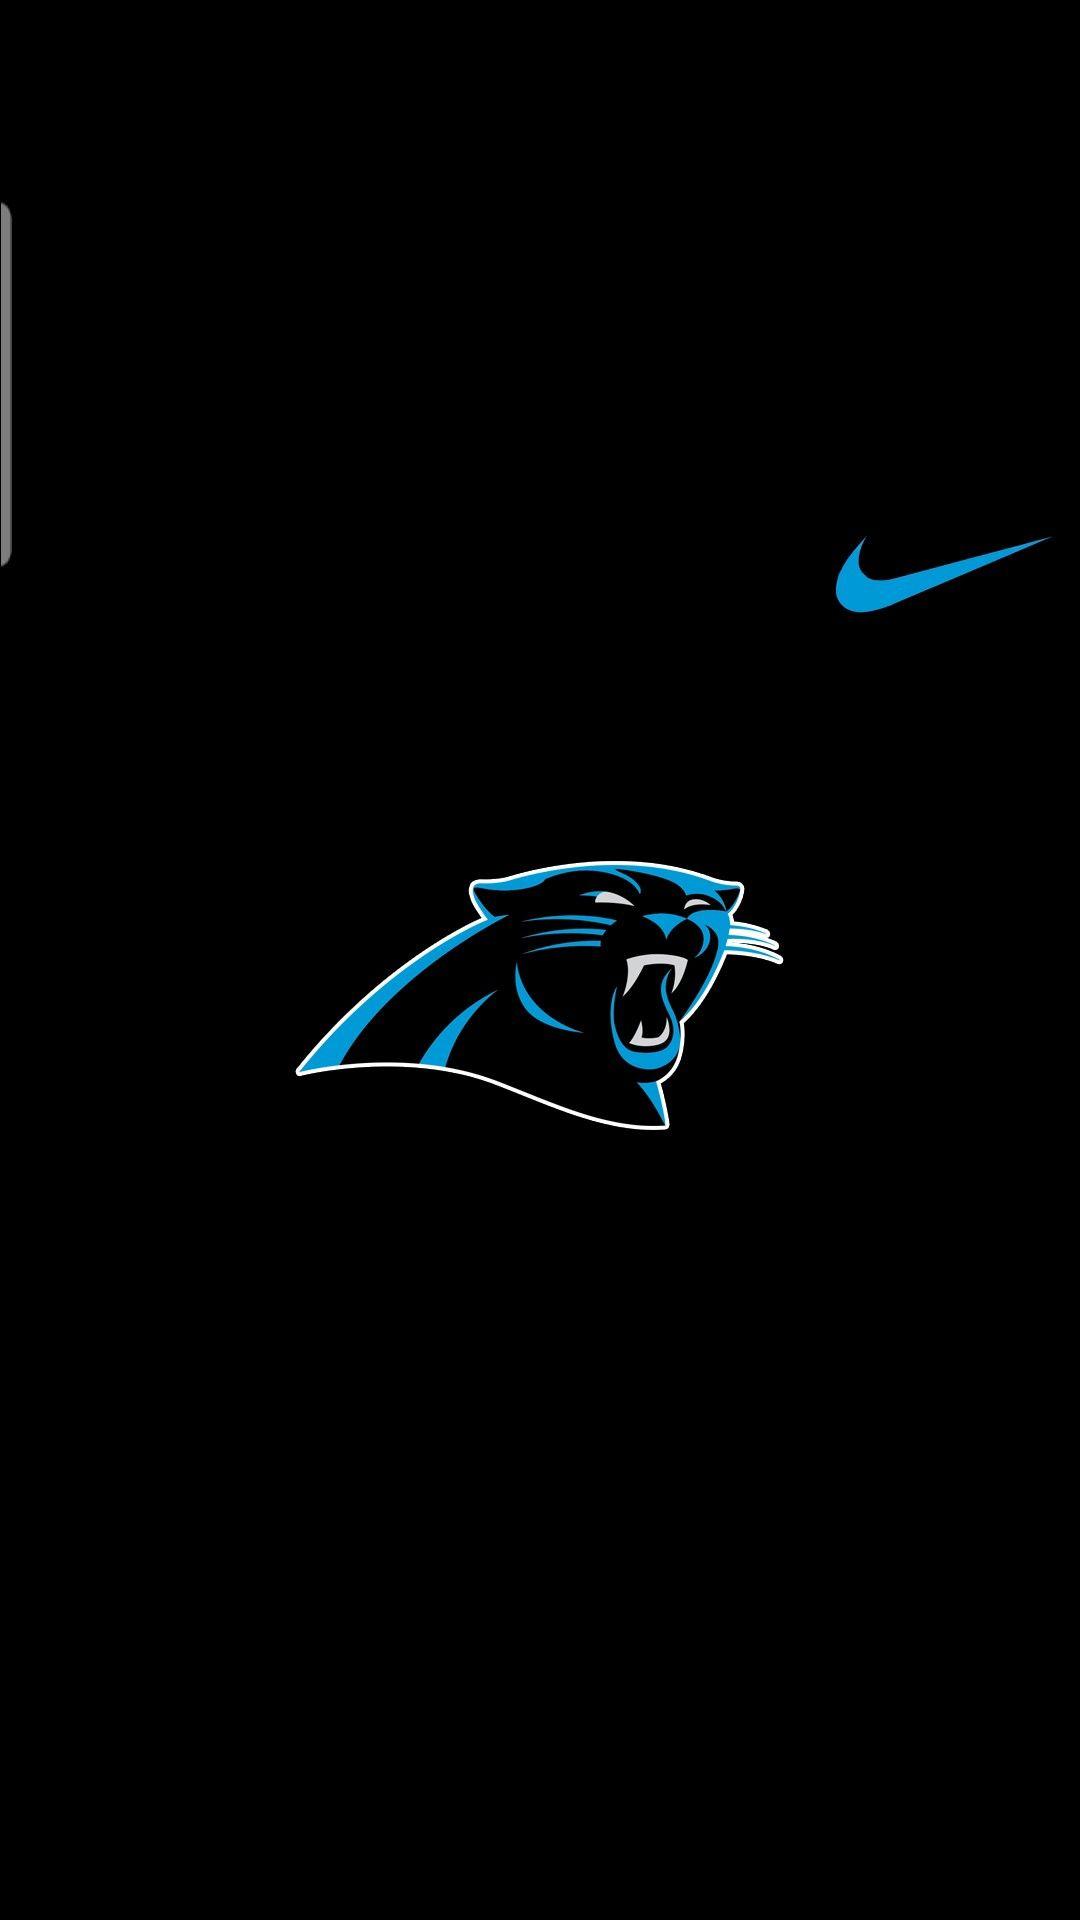 Pin By Denisha Hopkins On Sportz Wallpaperz Carolina Panthers Wallpaper Carolina Panthers Panthers